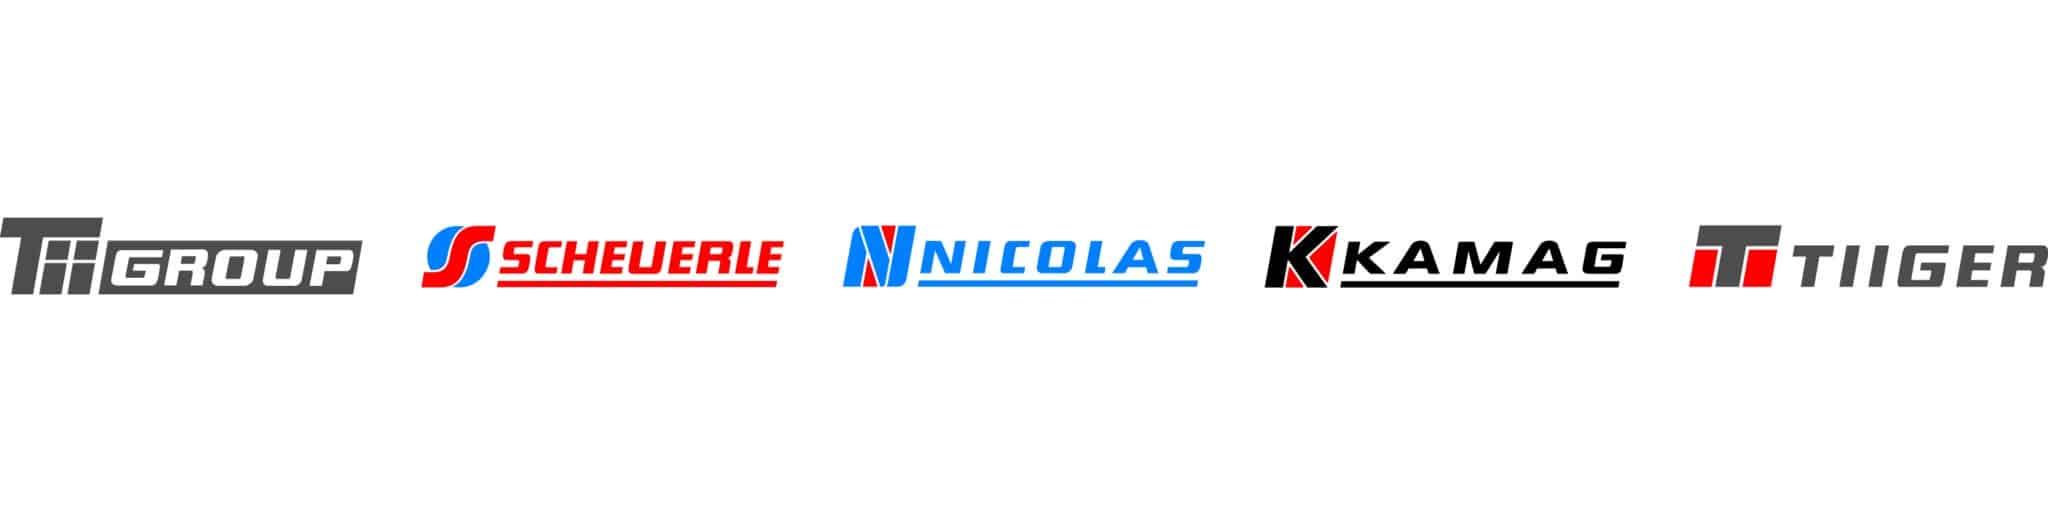 TII Group, Scheuerle, Nicolas, KAMAG, TIIGER, headline sponsor, the heavies